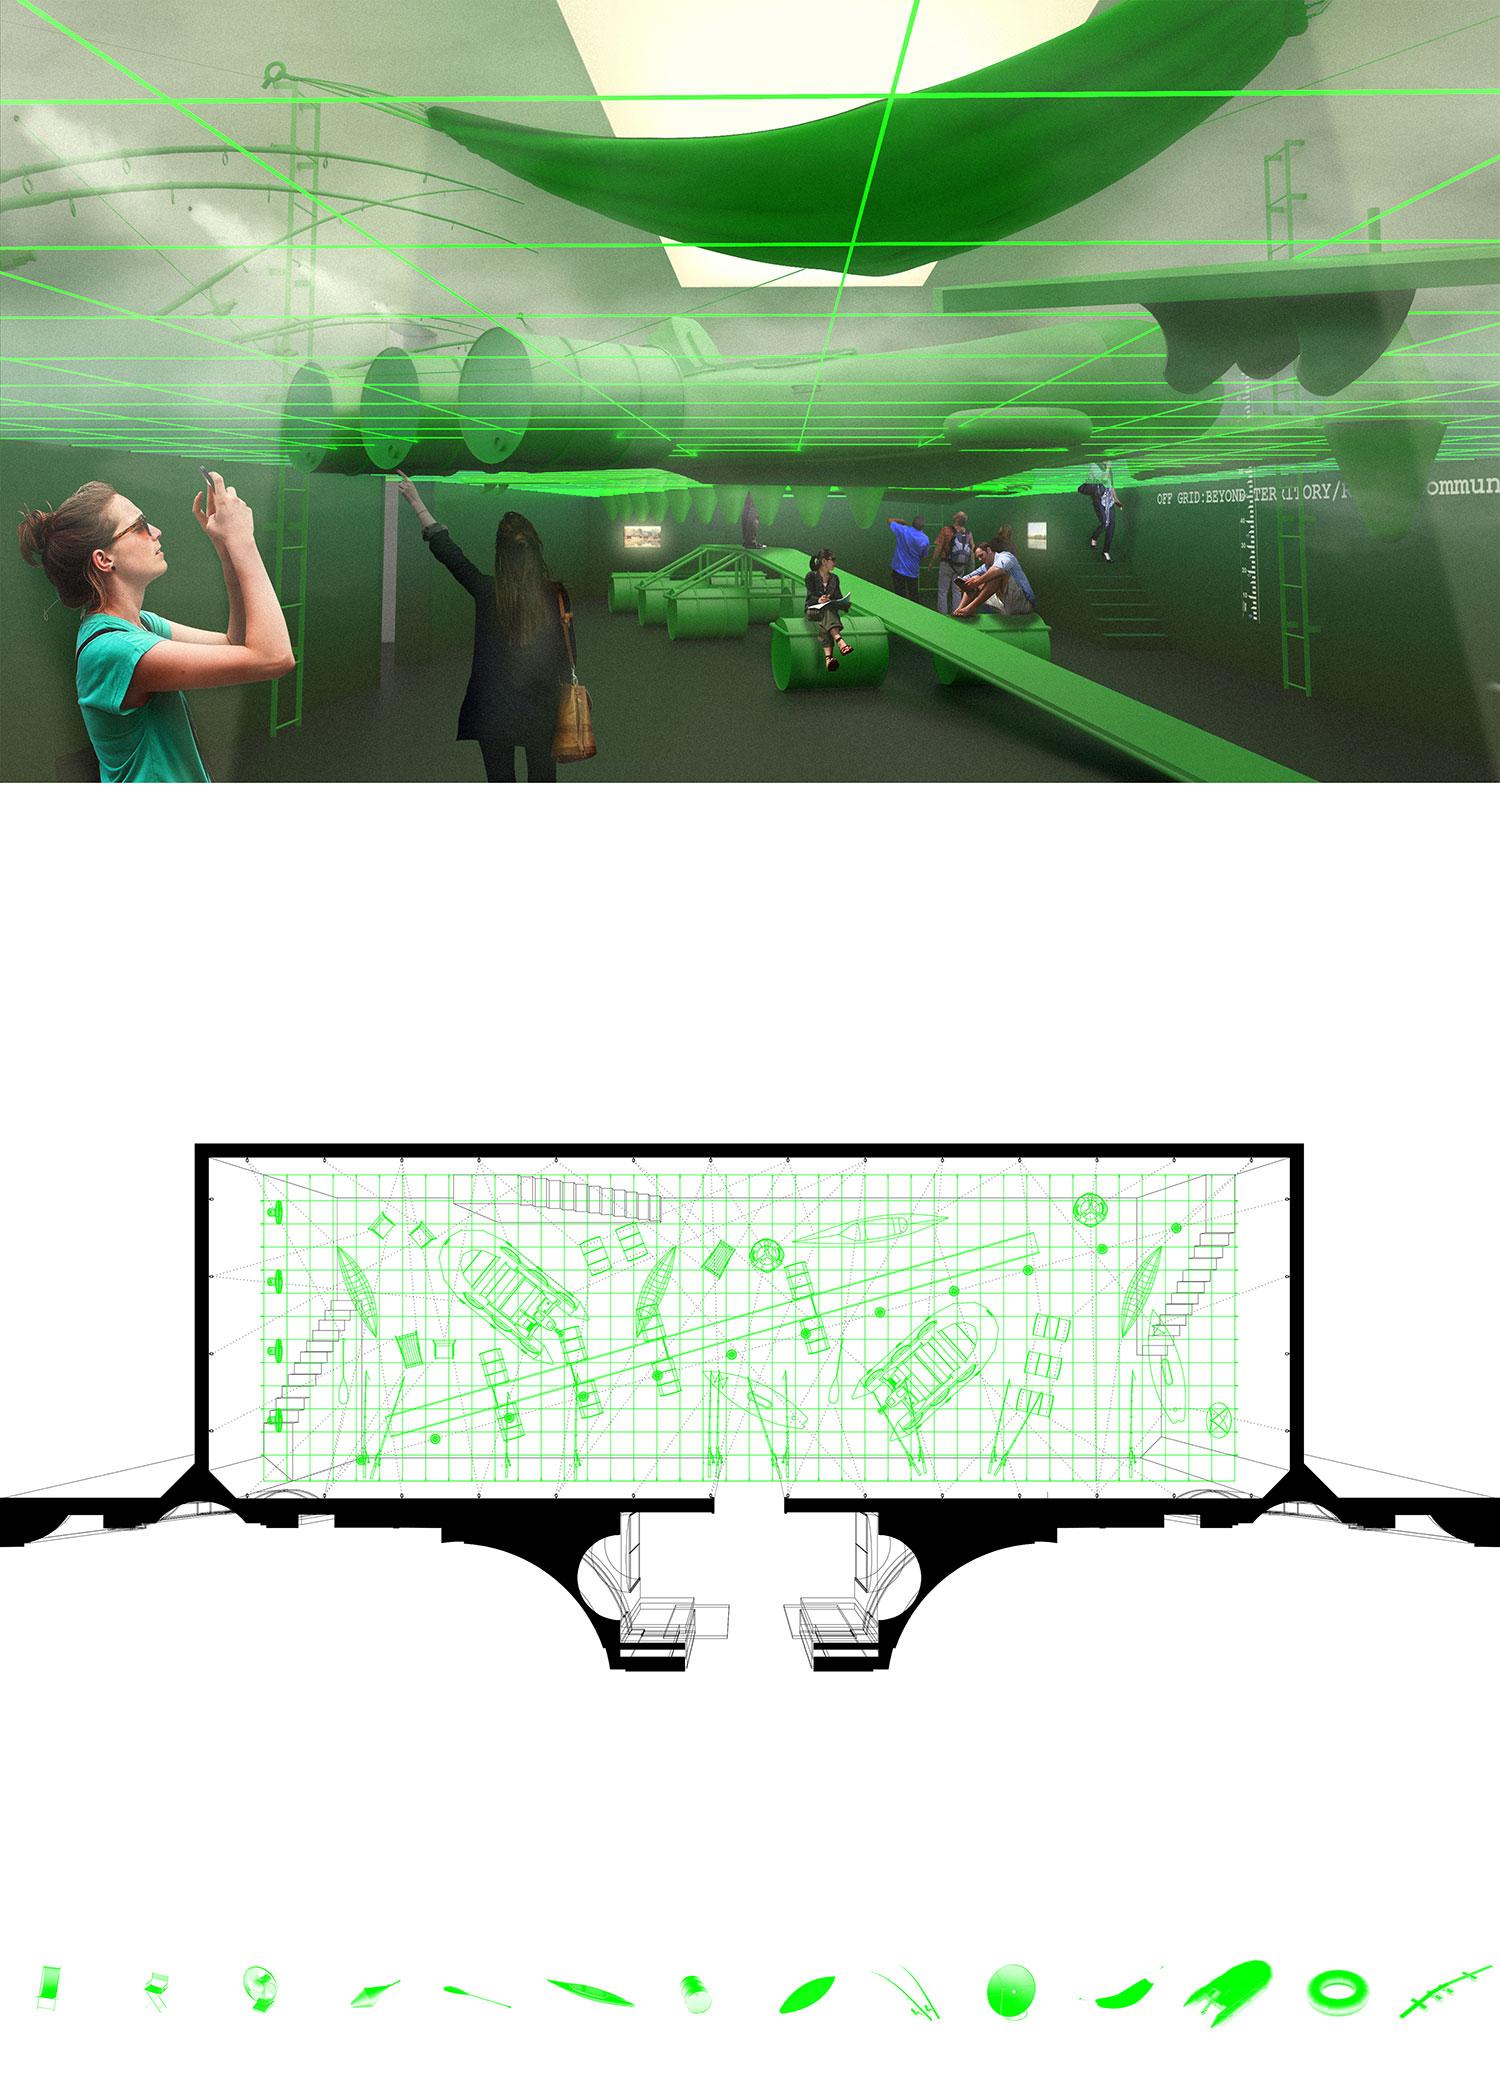 La-Biennale-di-Venezia-2018_Off-Grid-Plakat-1